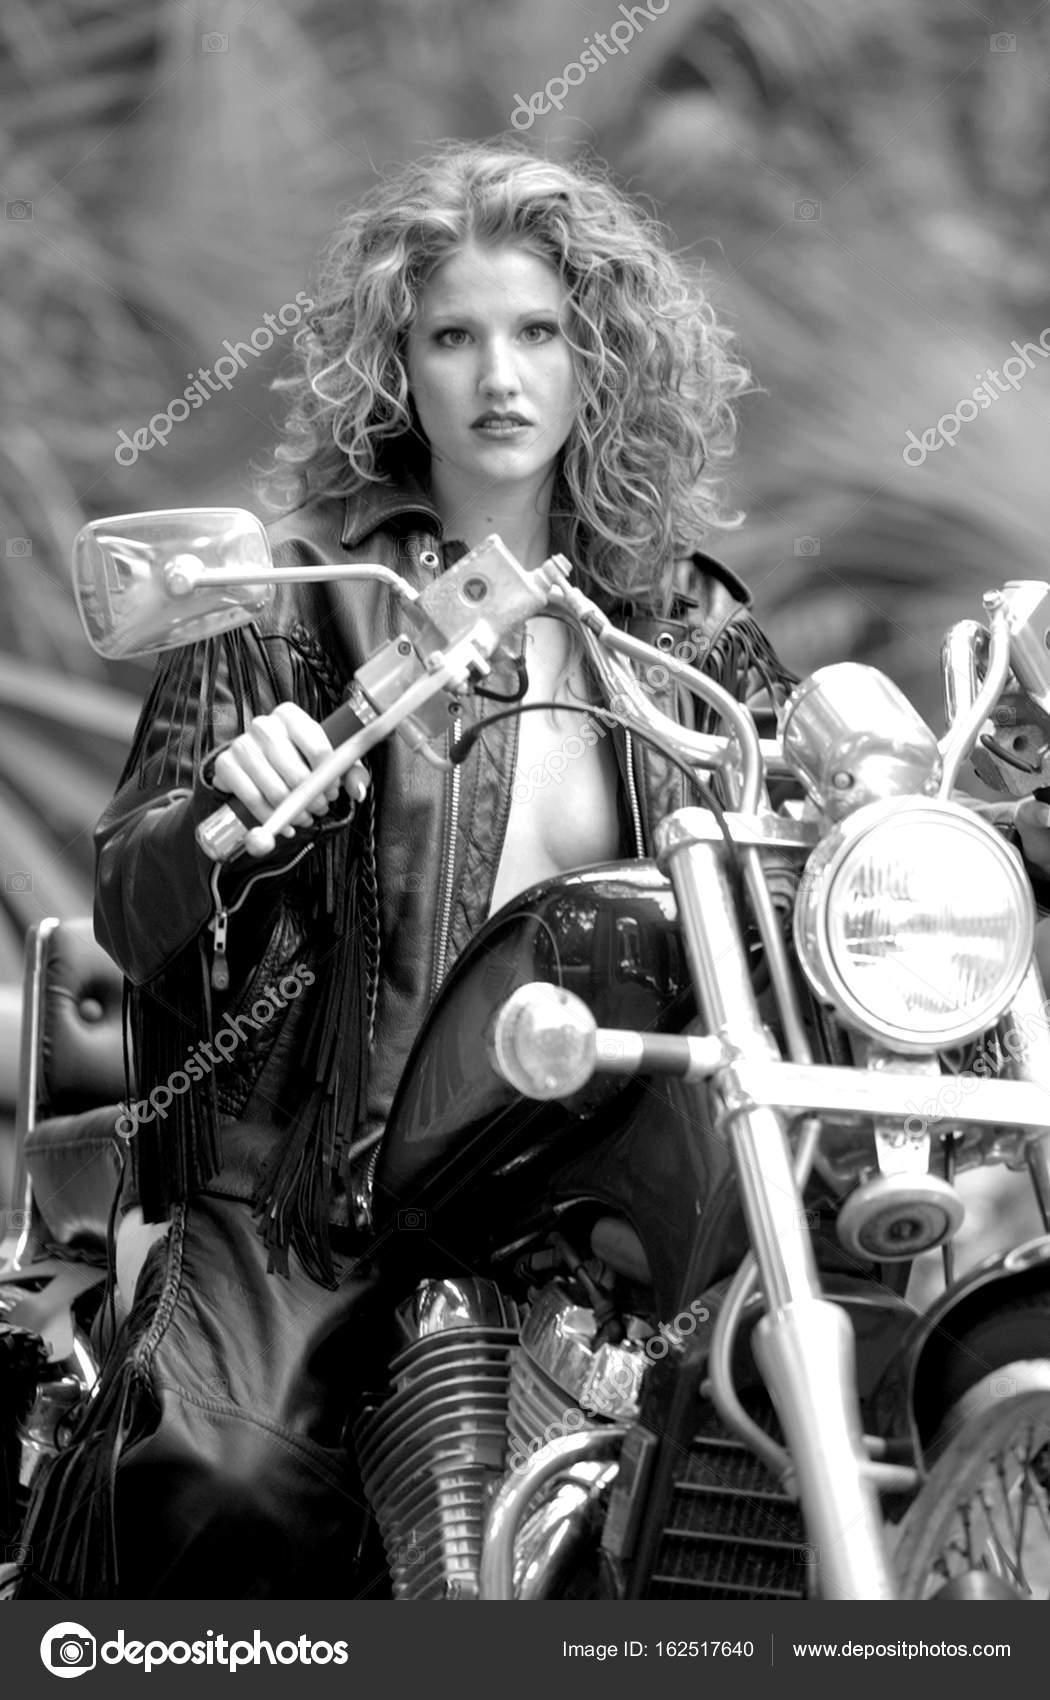 b6087308daee2 Chica pelirroja Biker en chaqueta de cuero — Fotos de Stock ...